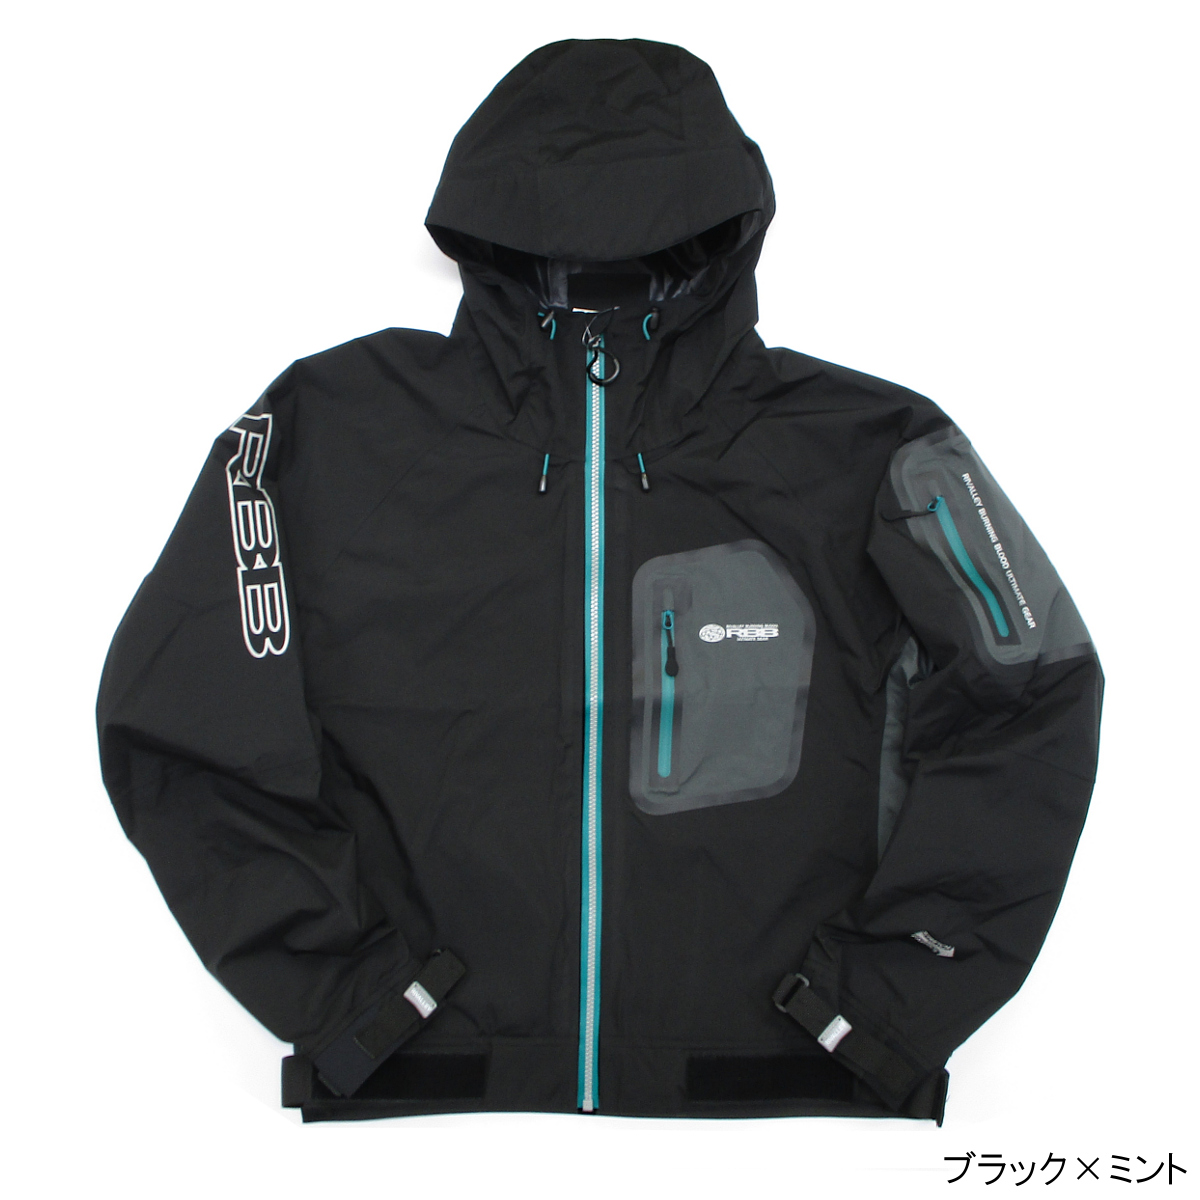 RBB タイドストレッチレインジャケット No.8746 L ブラック×ミント(東日本店)